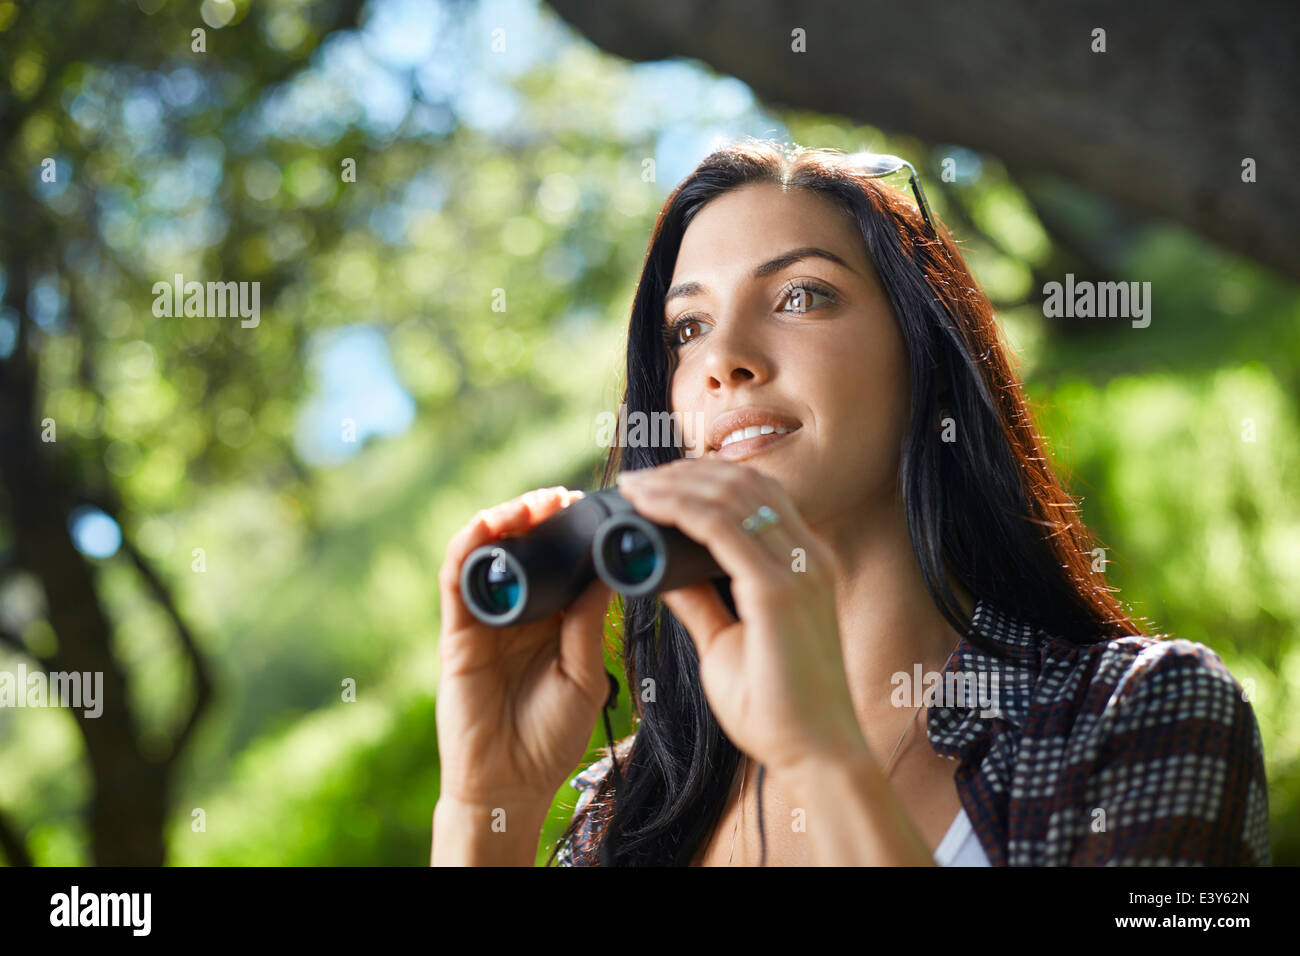 Qanliiy bak prisma optik objektiv fernglas vergrößerung